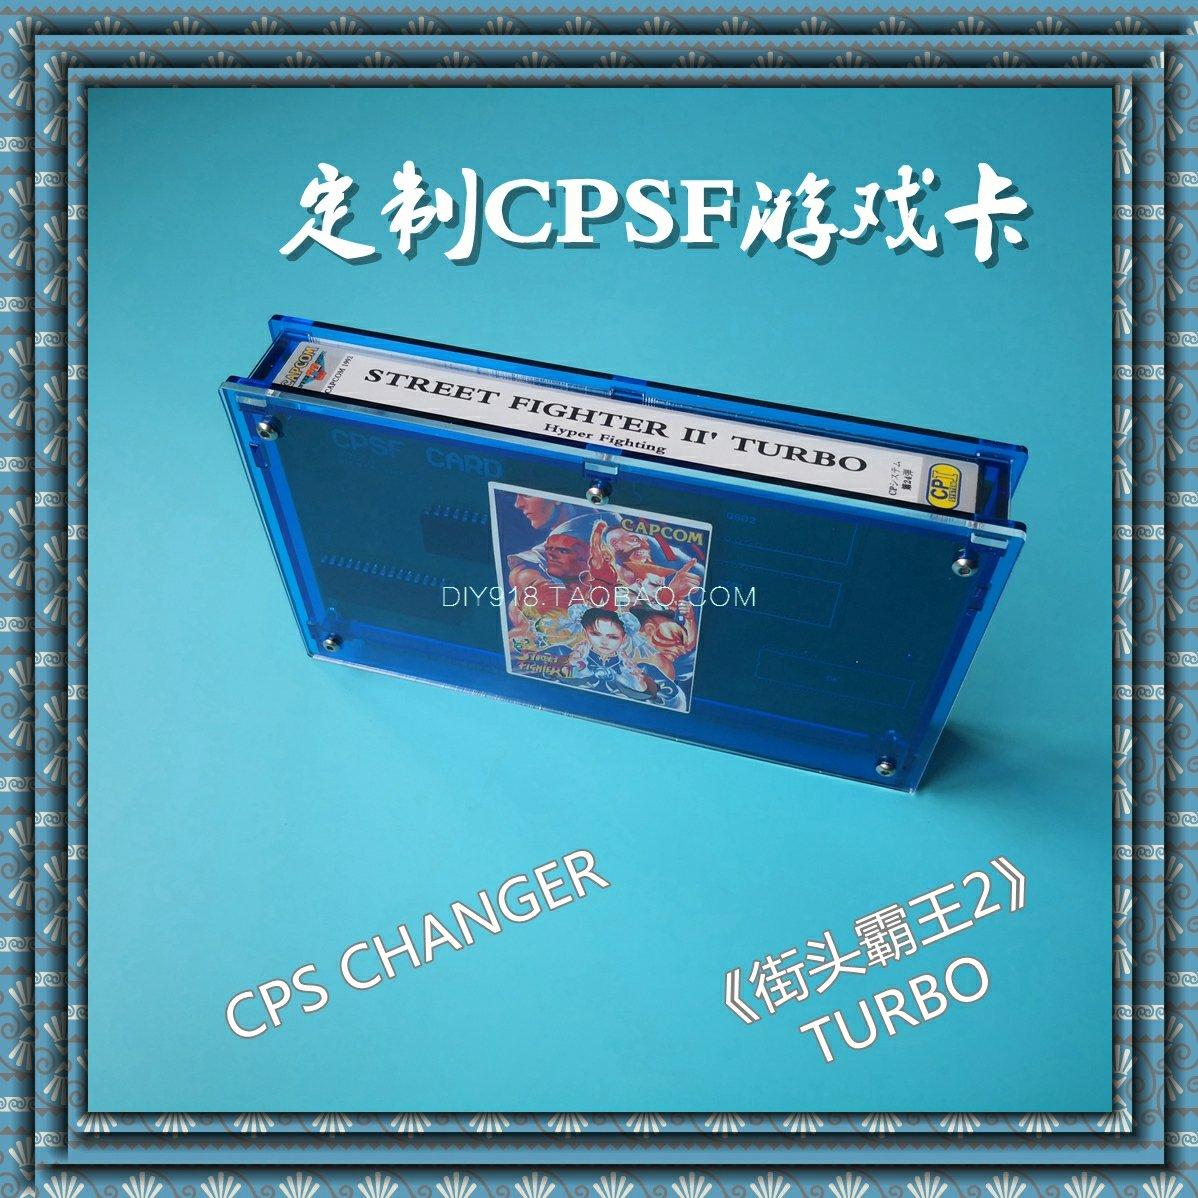 FD85F6AC-C2B1-456D-94AF-78C114299BBF.jpeg